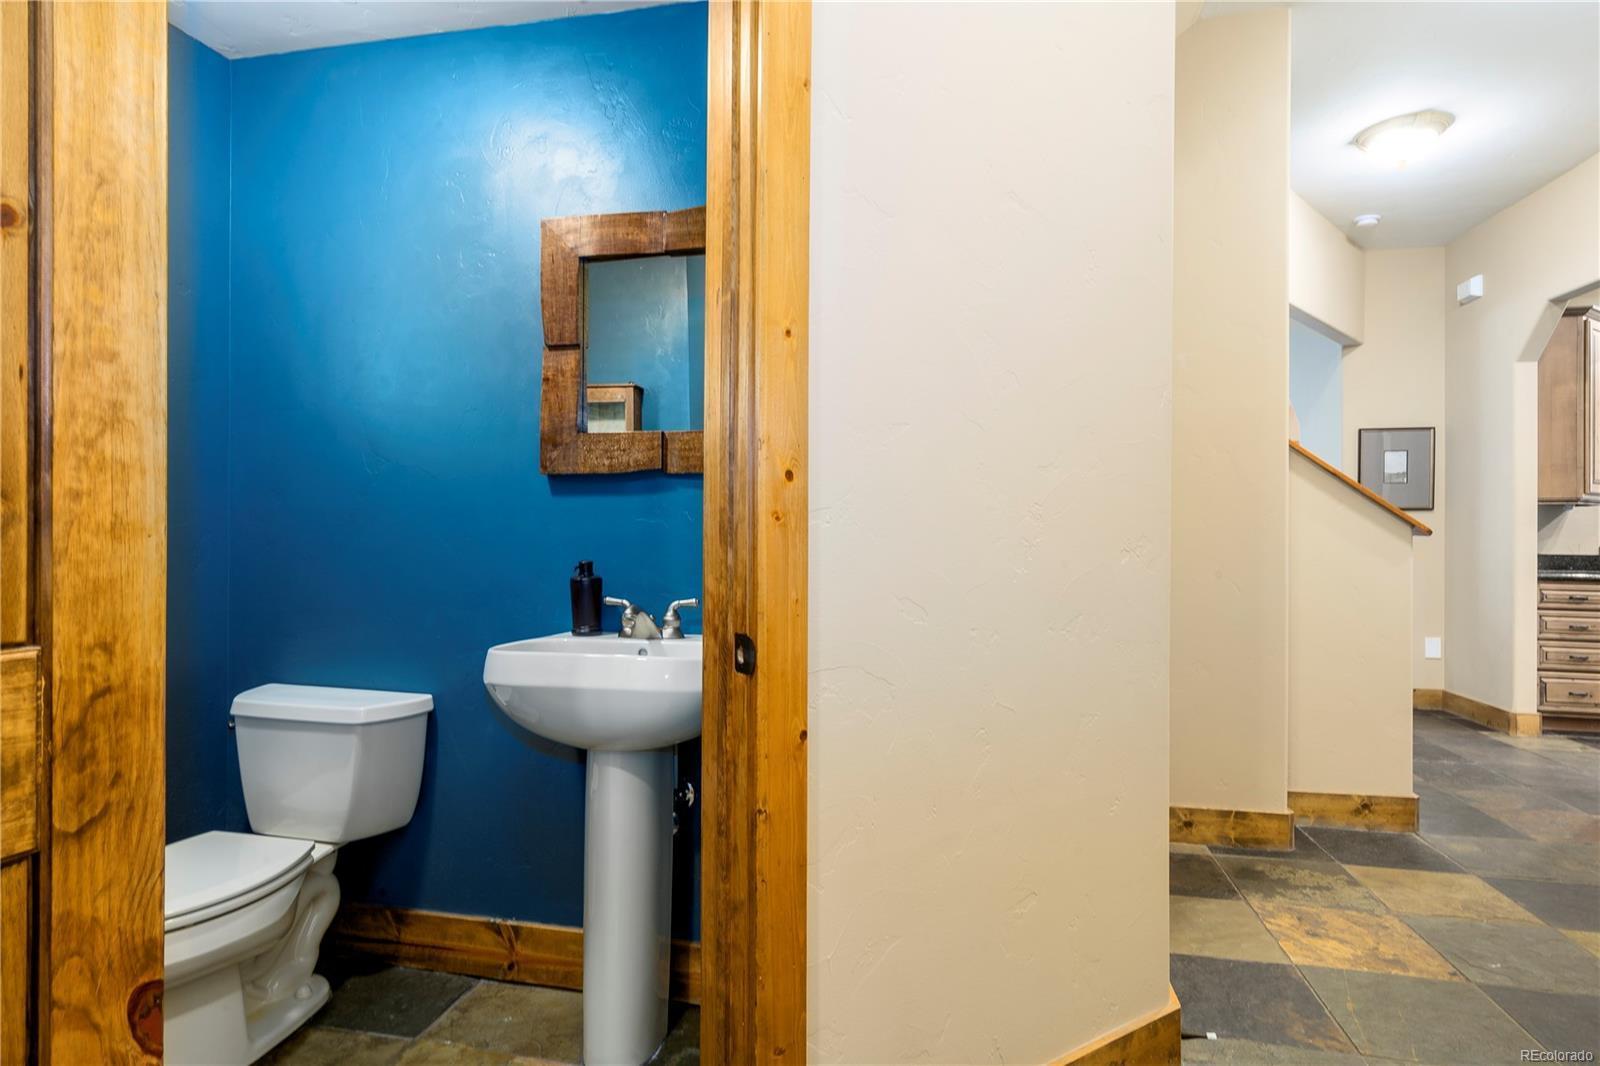 Lower Level Bathroom, Pedestal Sink, Mirror, and Toilet.